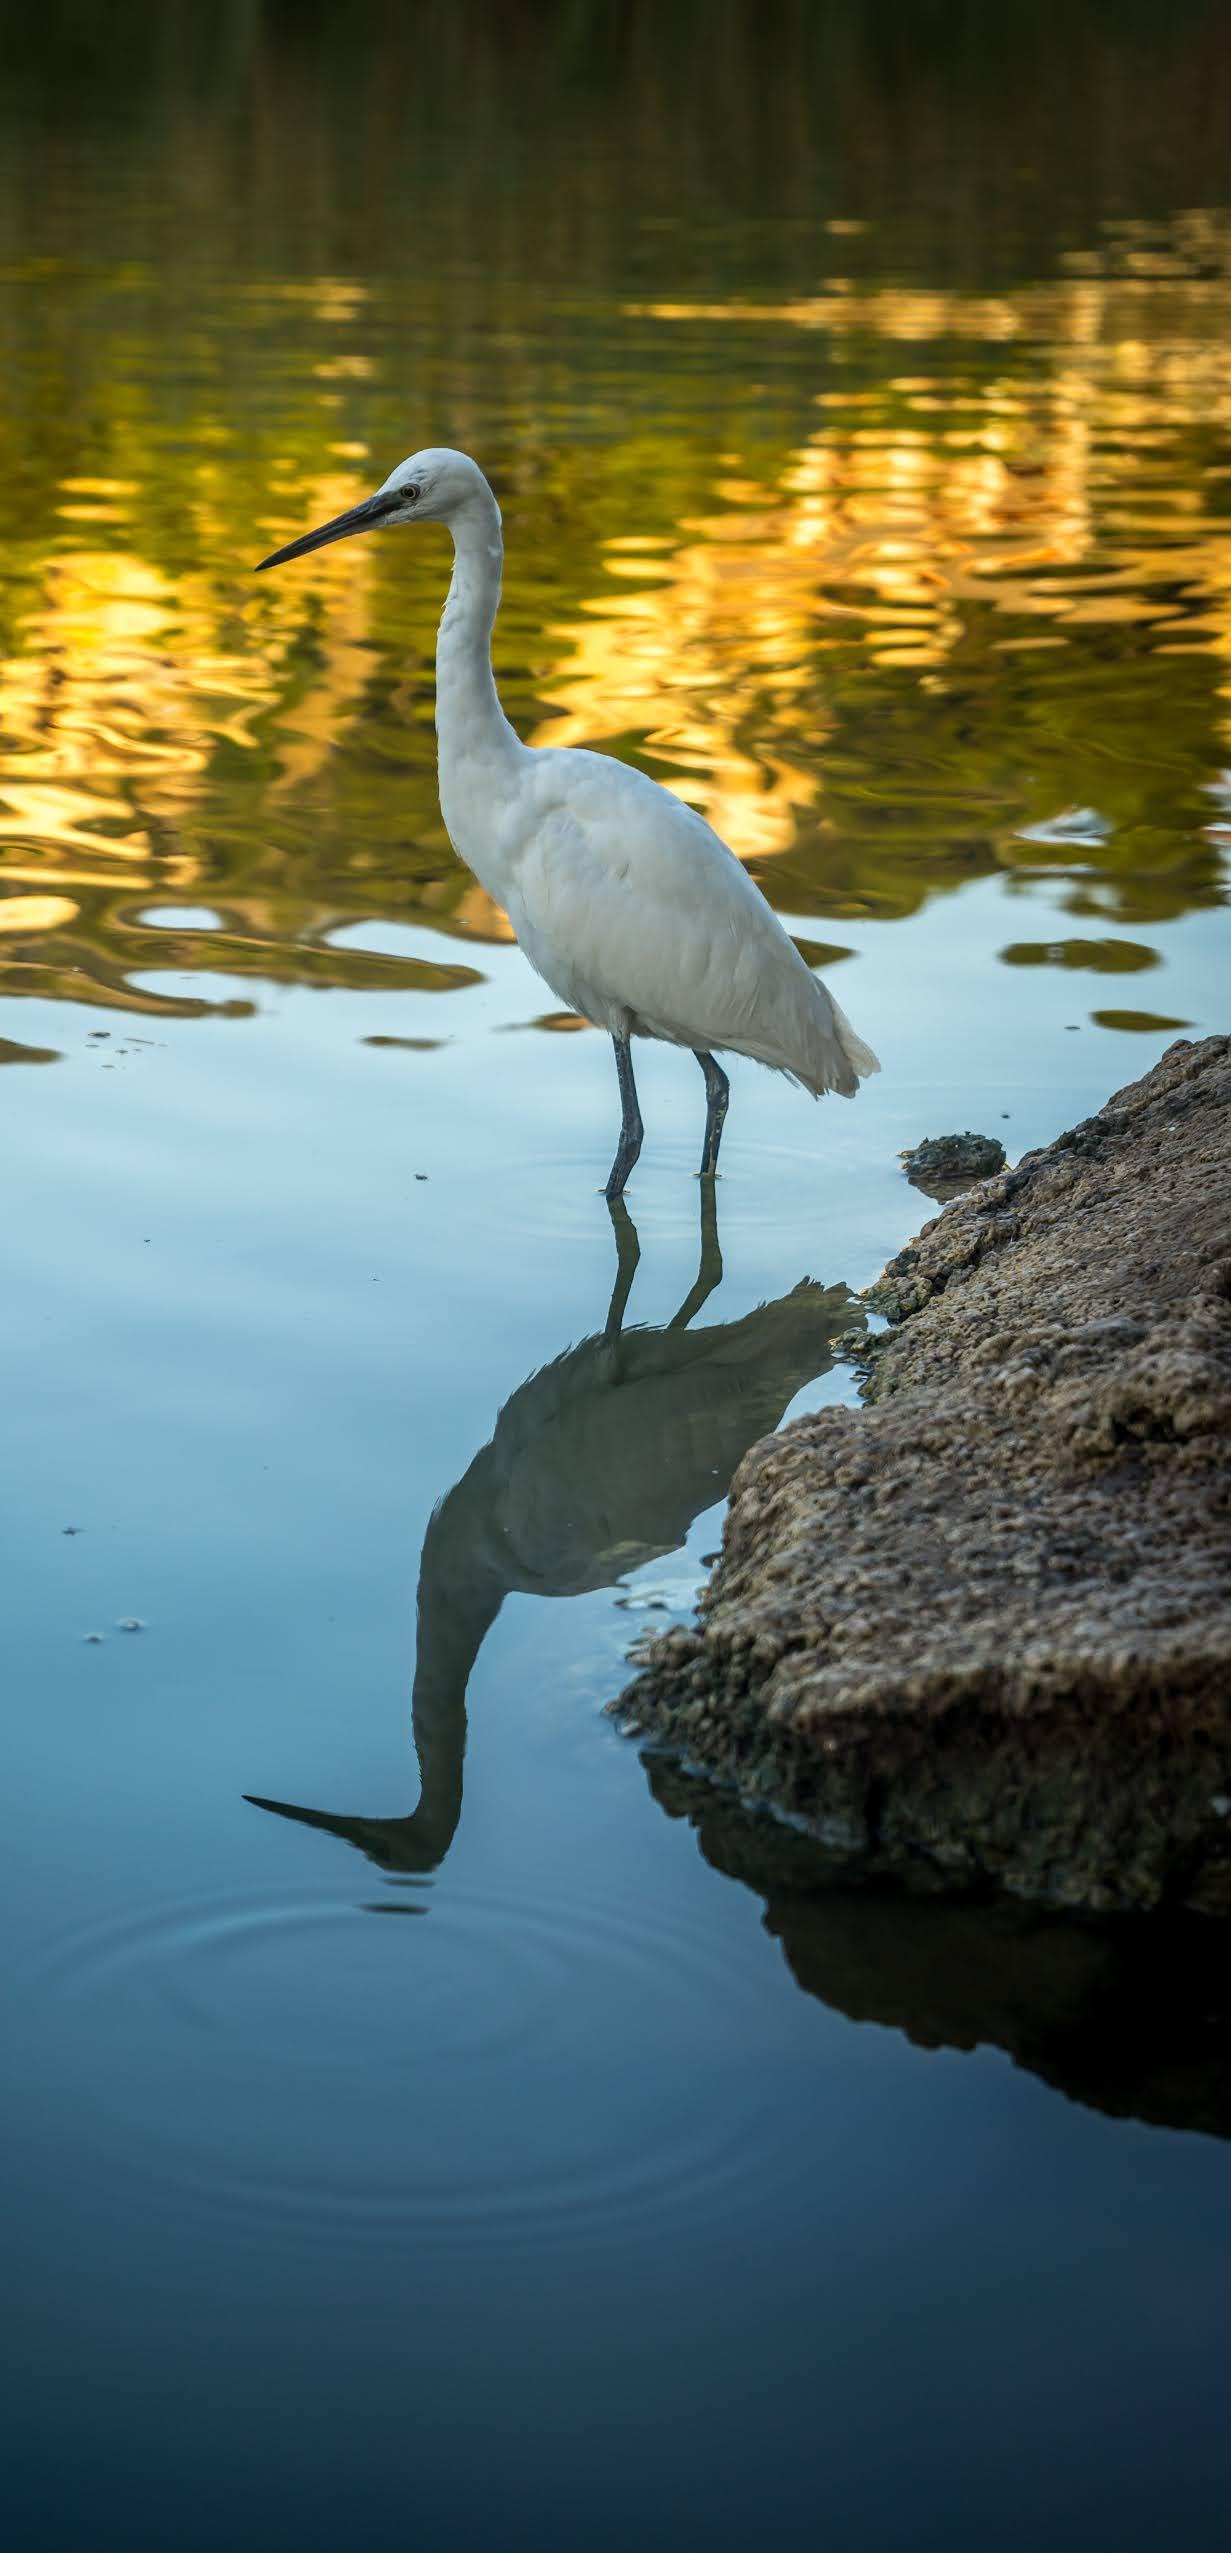 Great egret at a river bank.